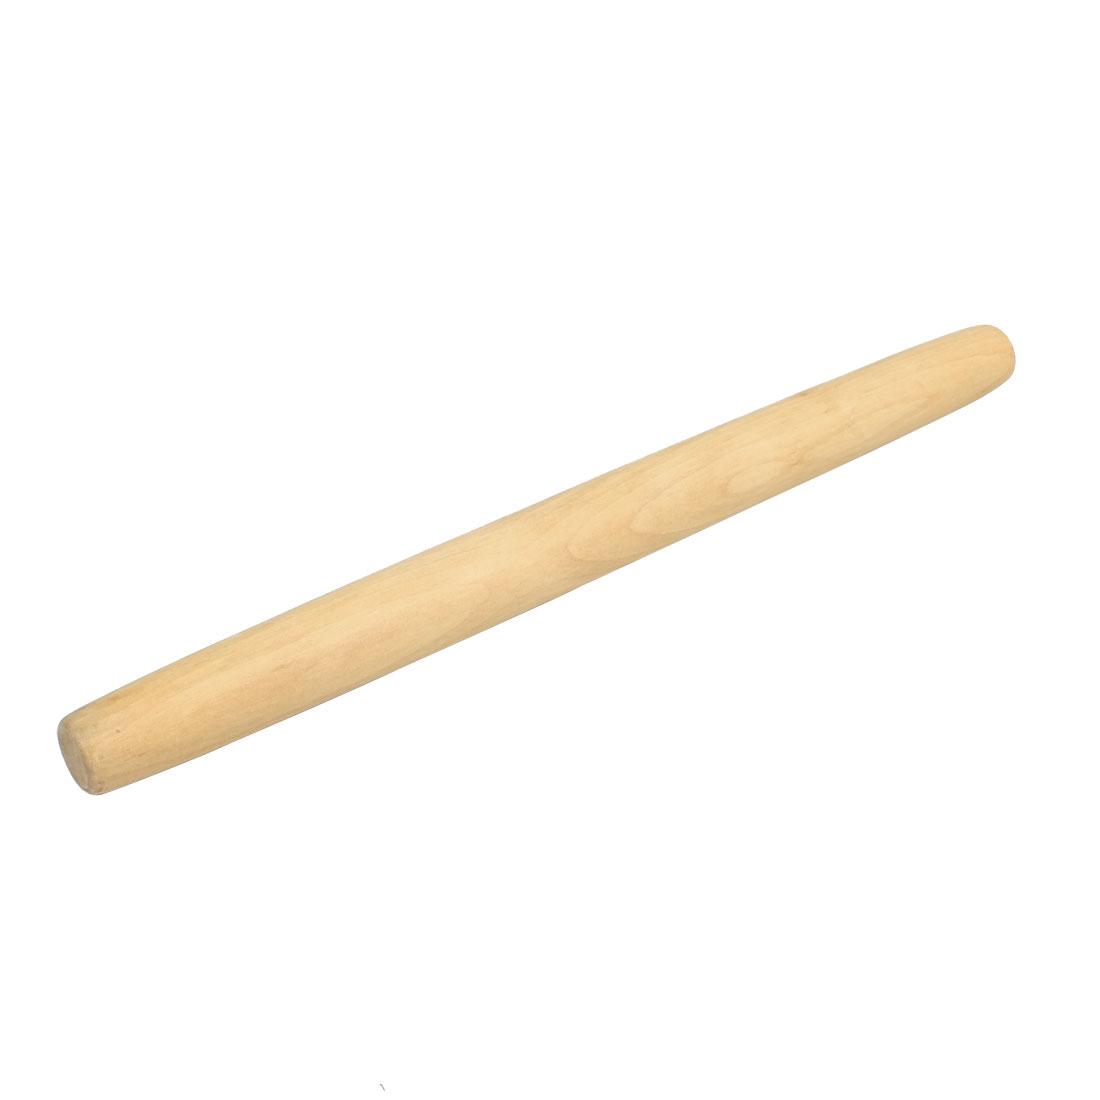 "Restaurant Kitchen Dough Pie Roll Wooden Rolling Pin Holder 15.4"" Long"